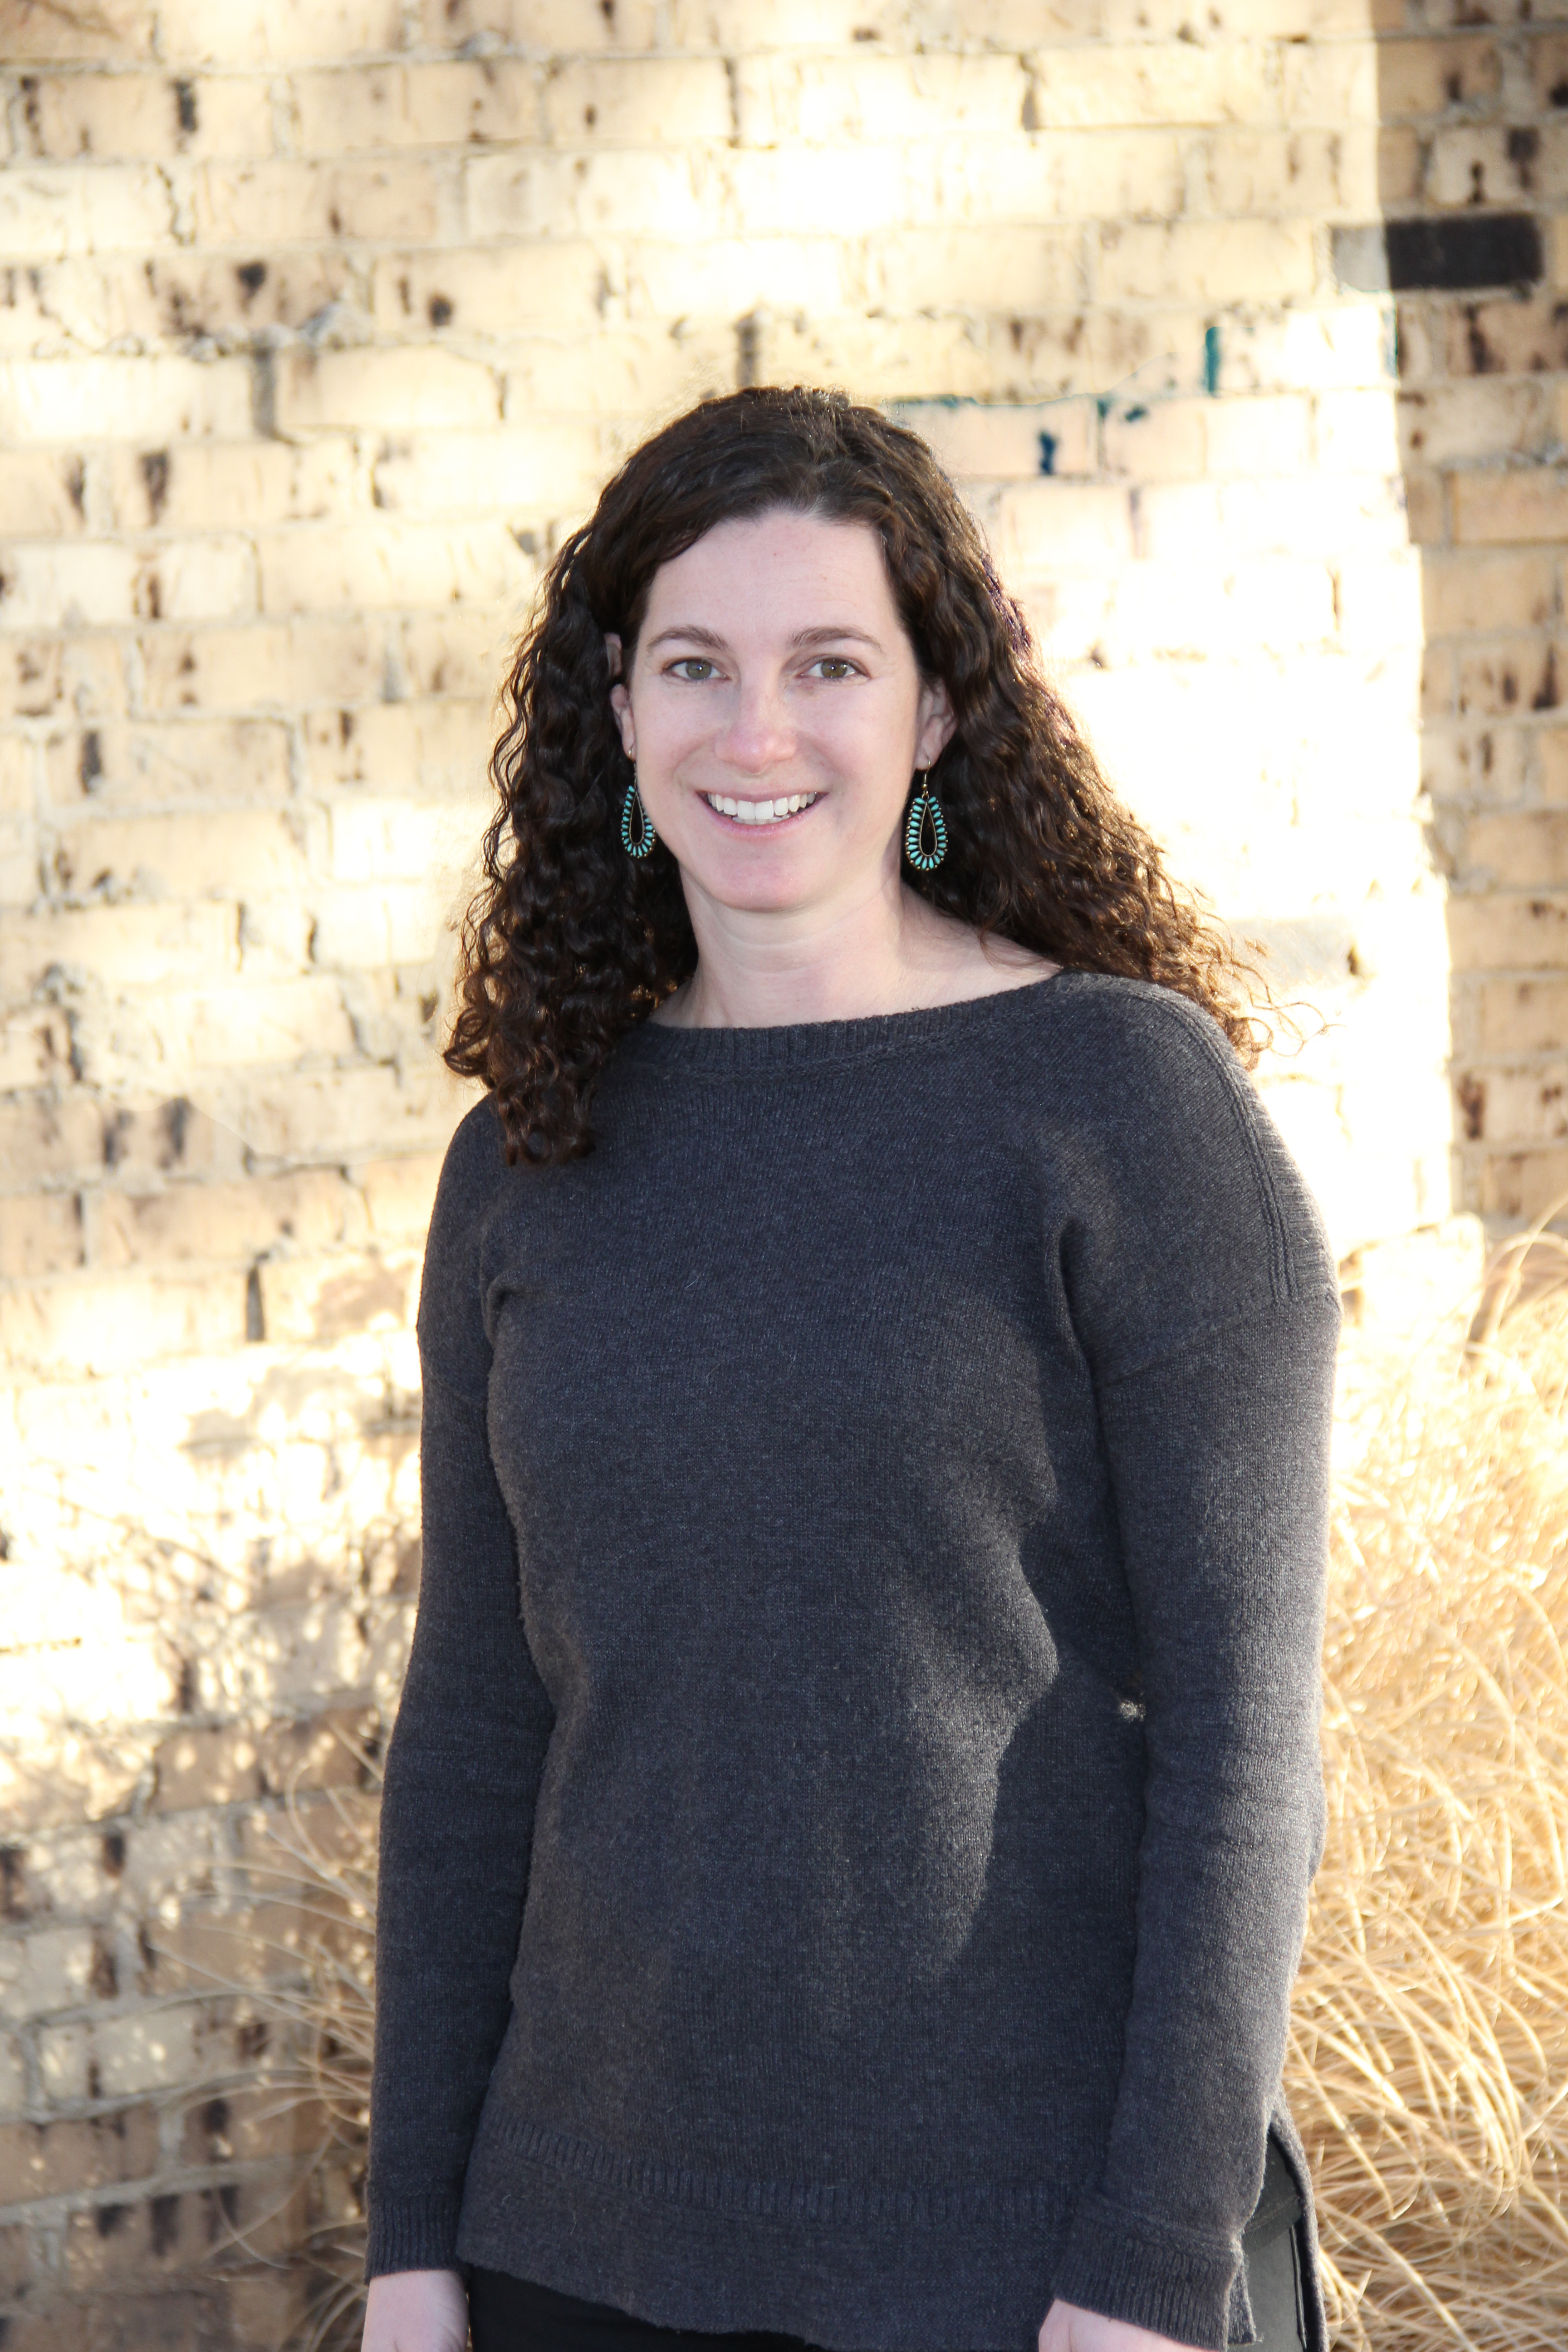 Beth Kleinman